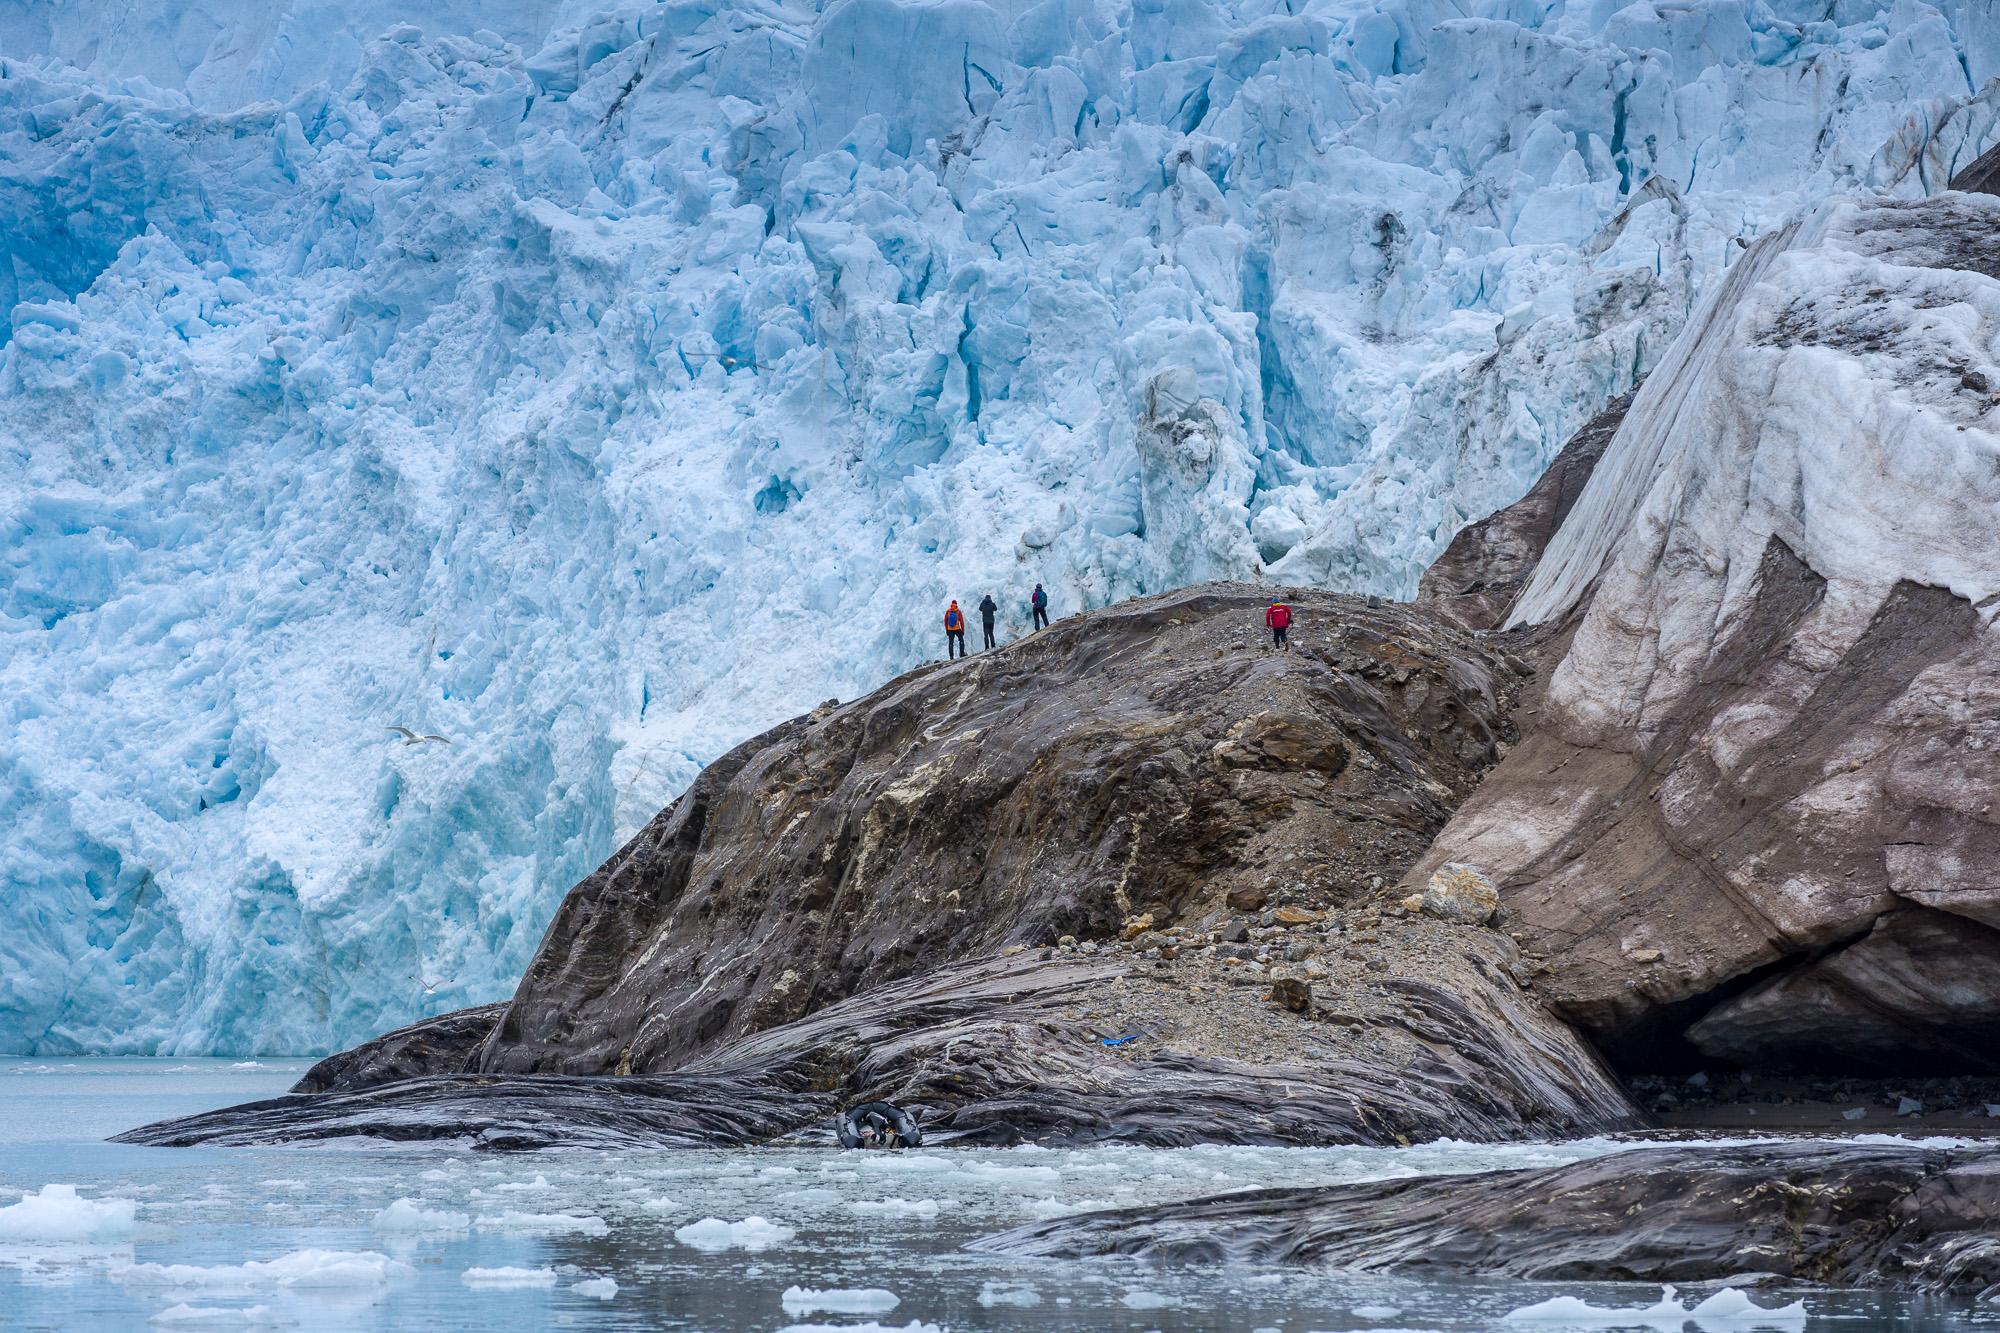 Vancoillie - Spitsbergen - 2018-07-02_98A2436.jpg